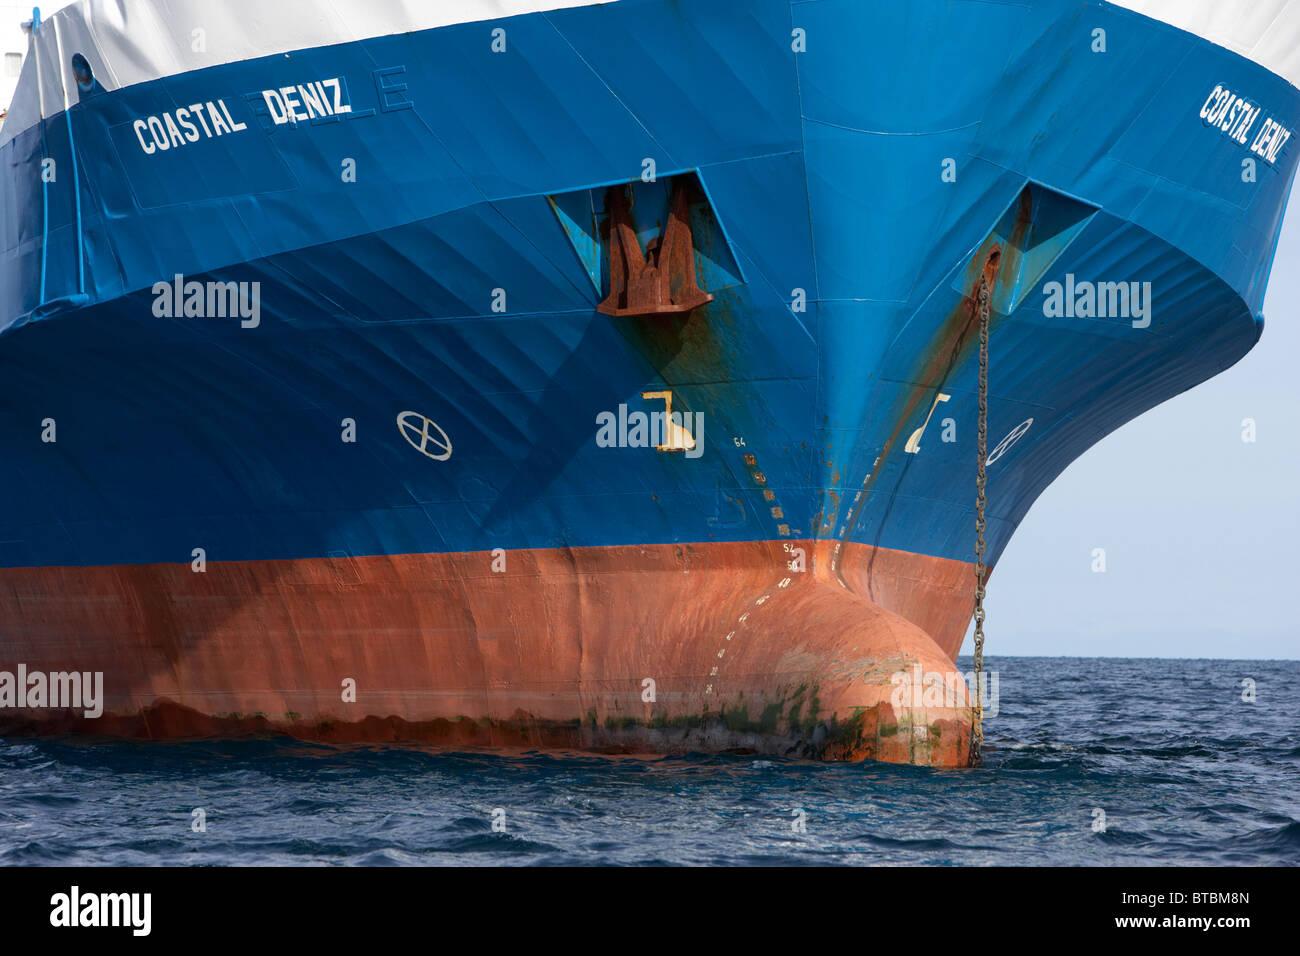 bulbous bow and anchors coastal deniz dry cargo hazard a major ship at anchor in coastal waters of the uk - Stock Image